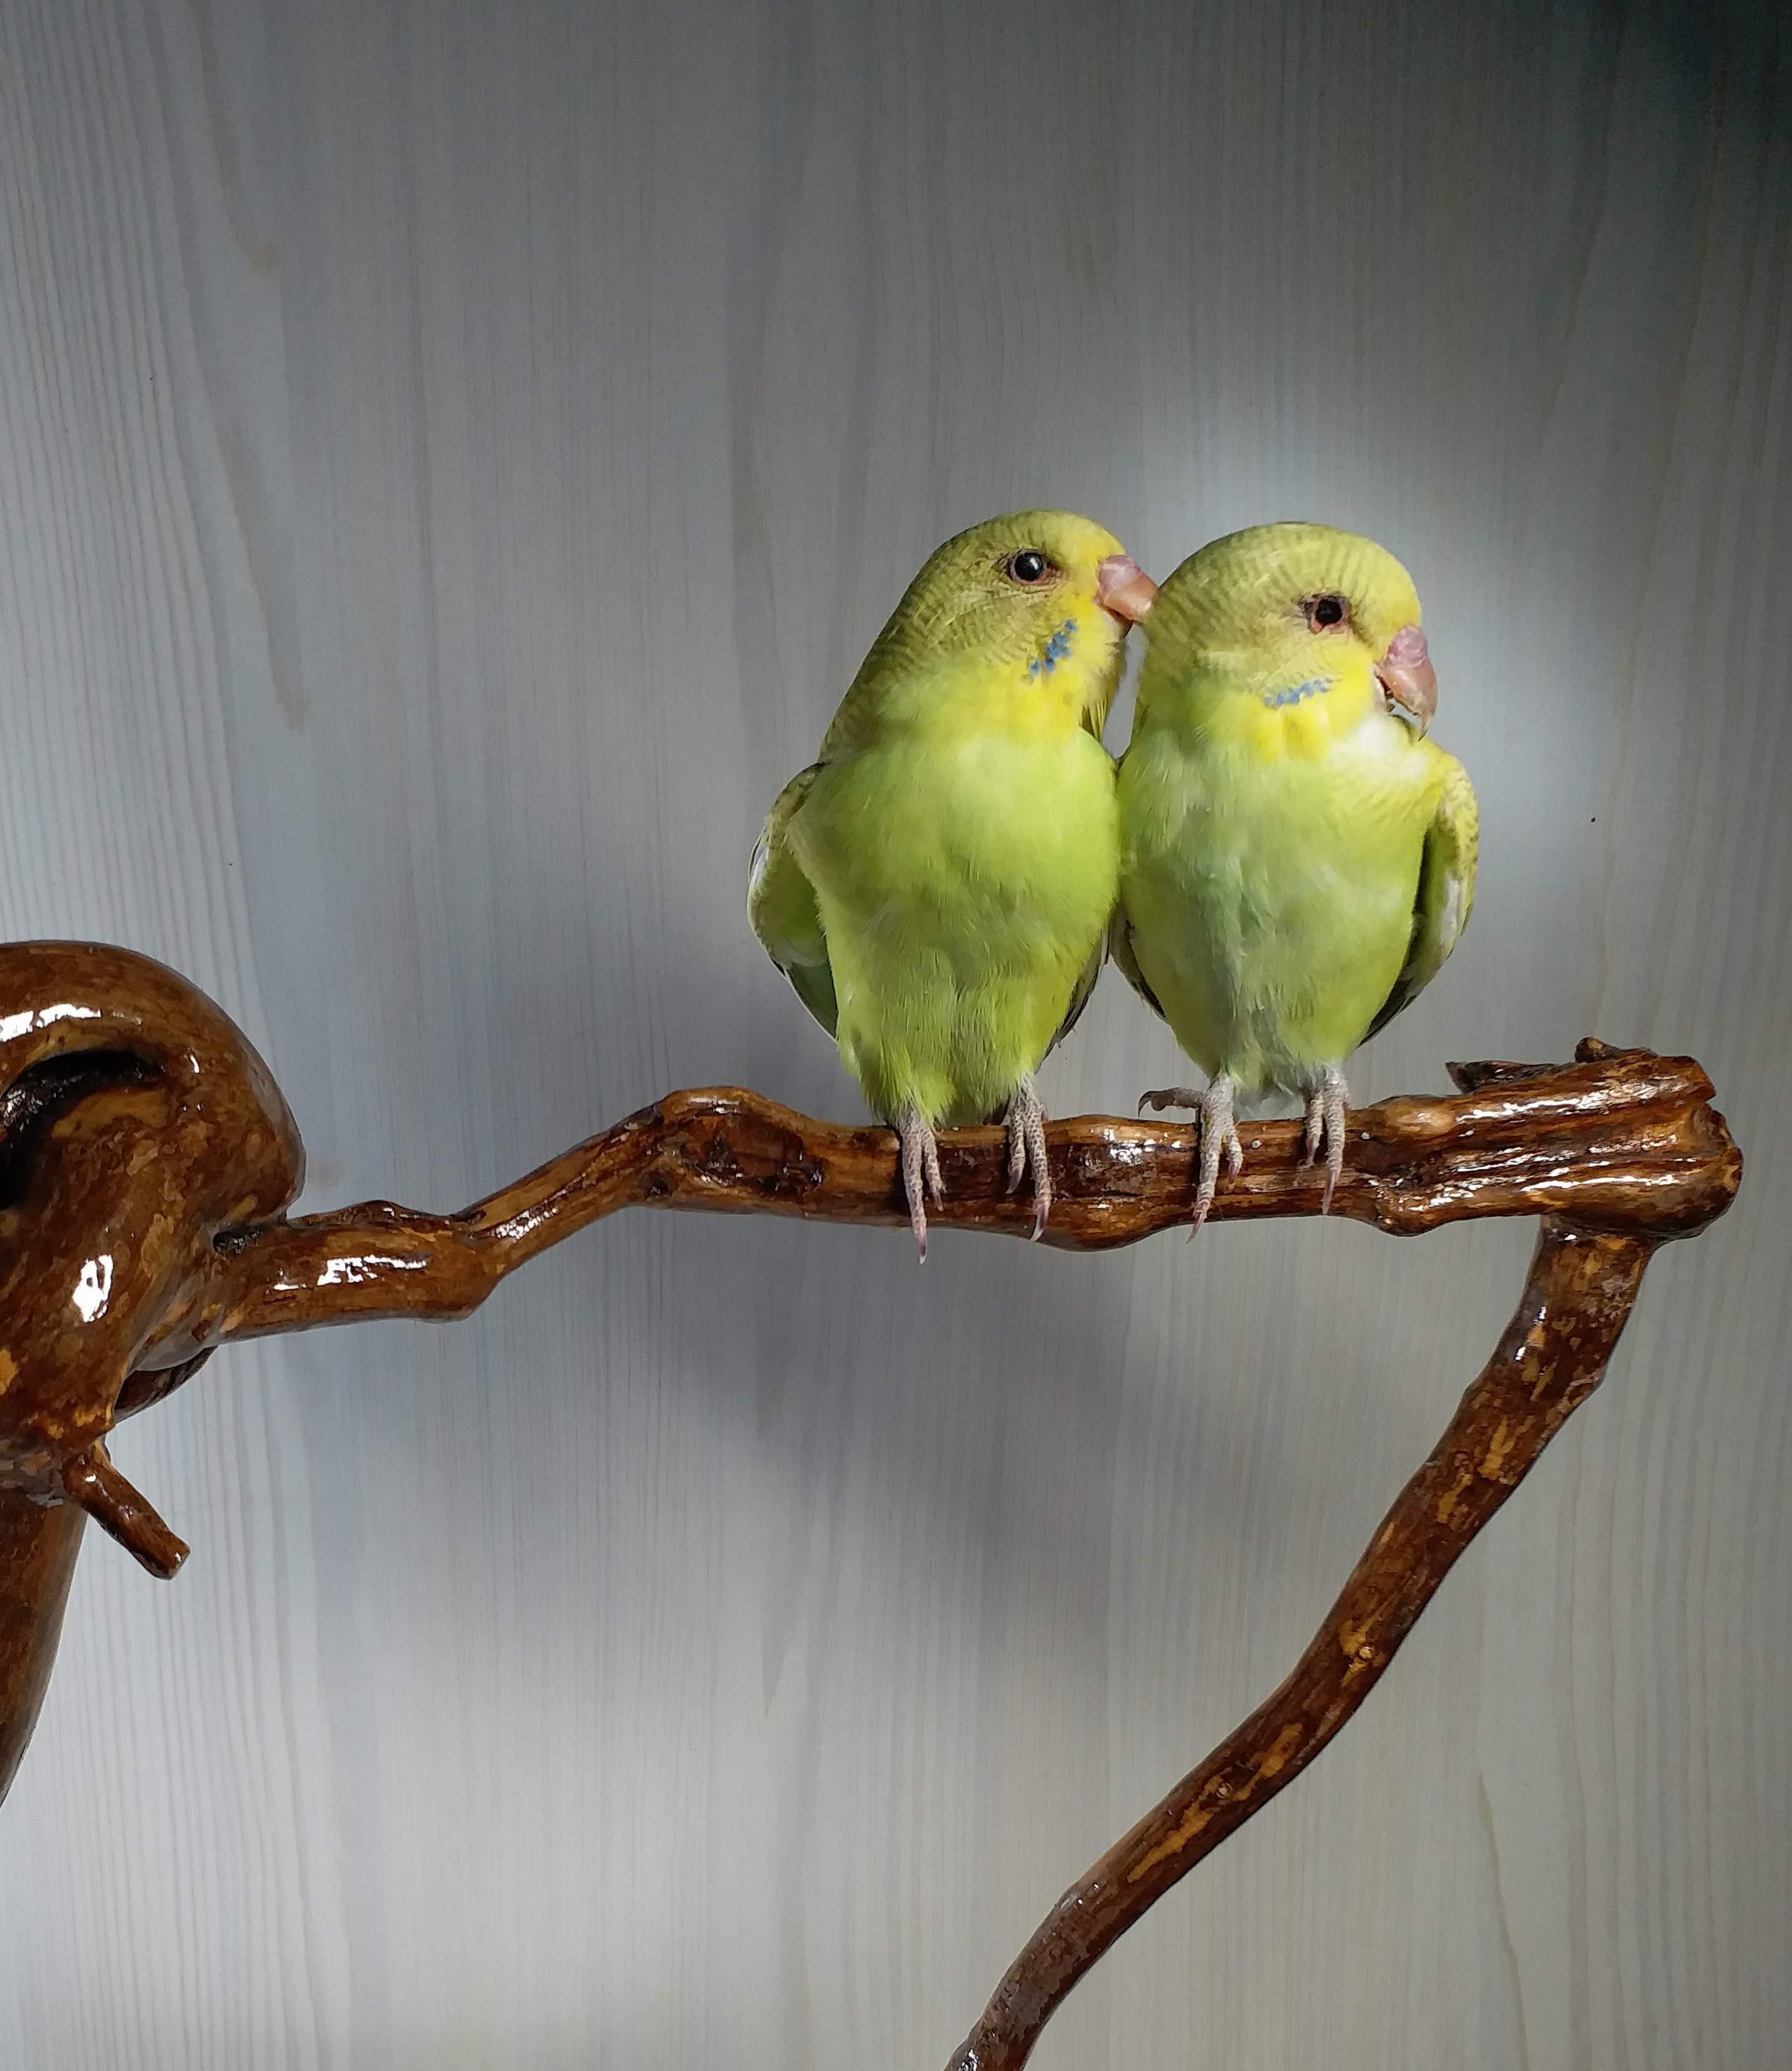 Teaching specimens birds parrot specimens pigeon specimens pearl specimens home window ornaments decorative crafts